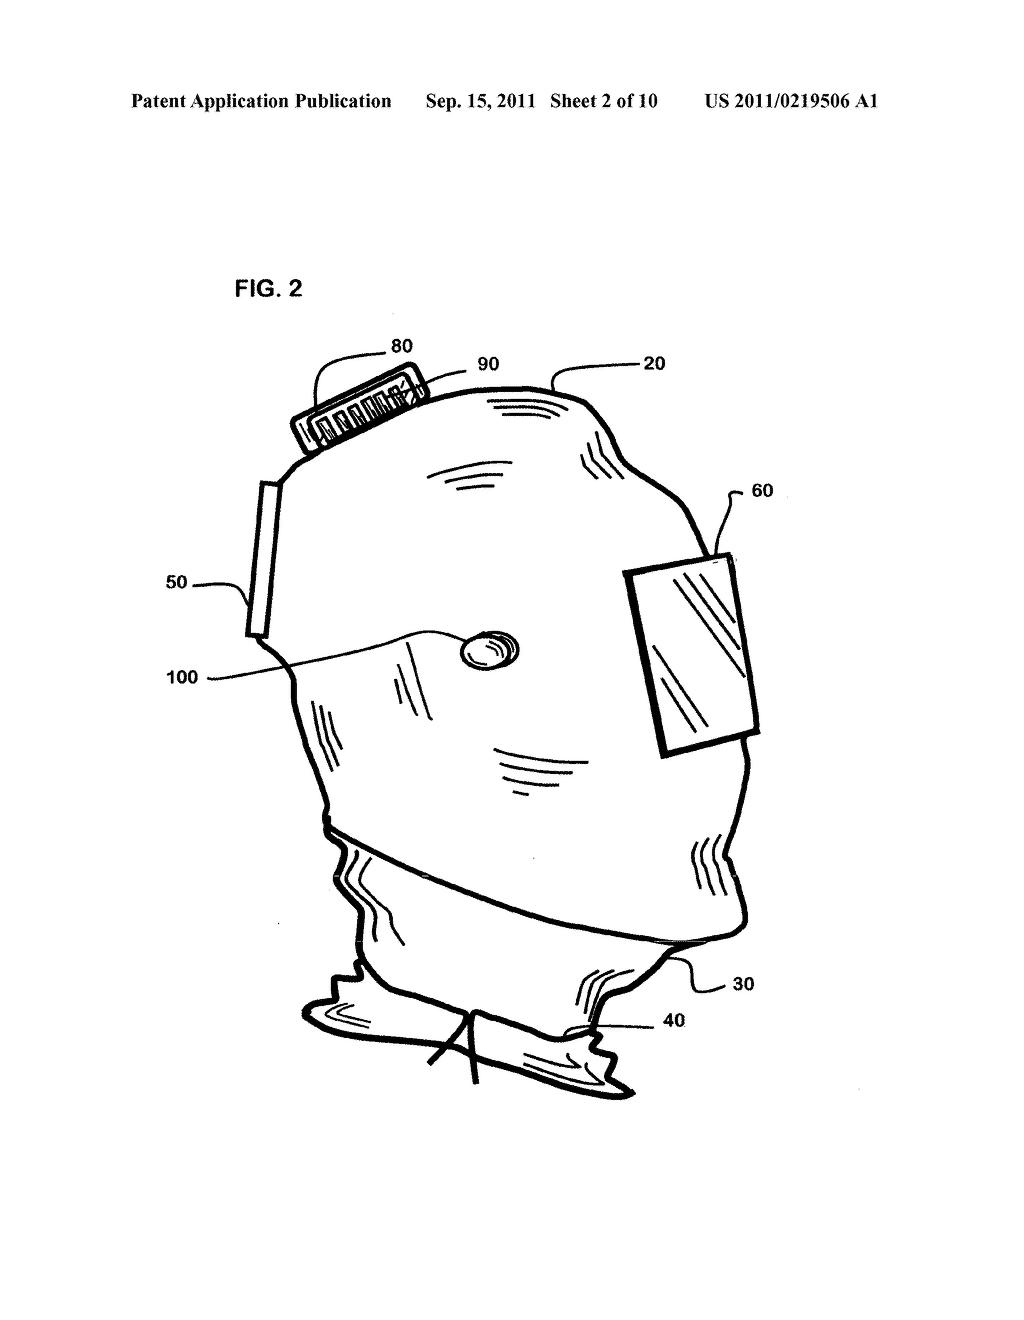 Cool clean air welding helmet diagram schematic and image 03 rh patentsencyclopedia welding machine diagram